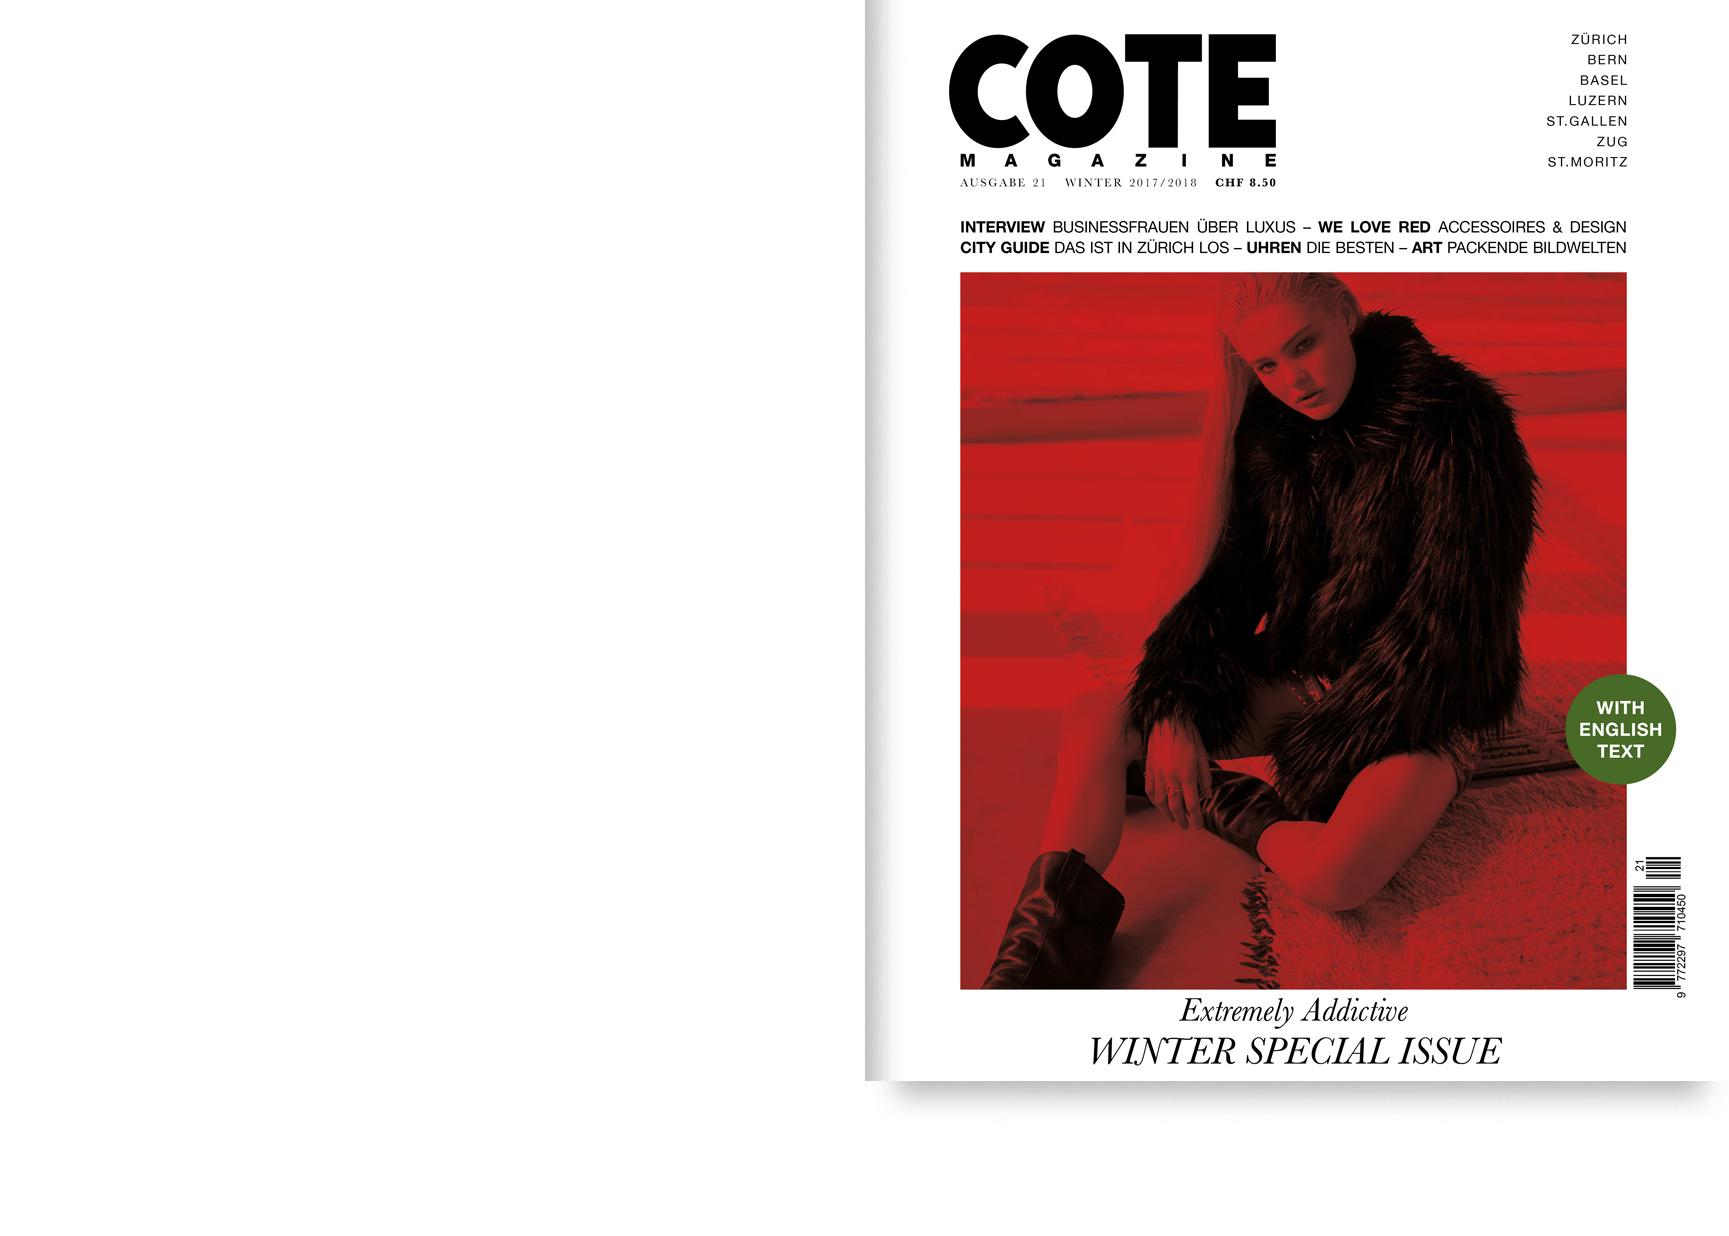 Studio Sturzenegger | COTE ZURICH